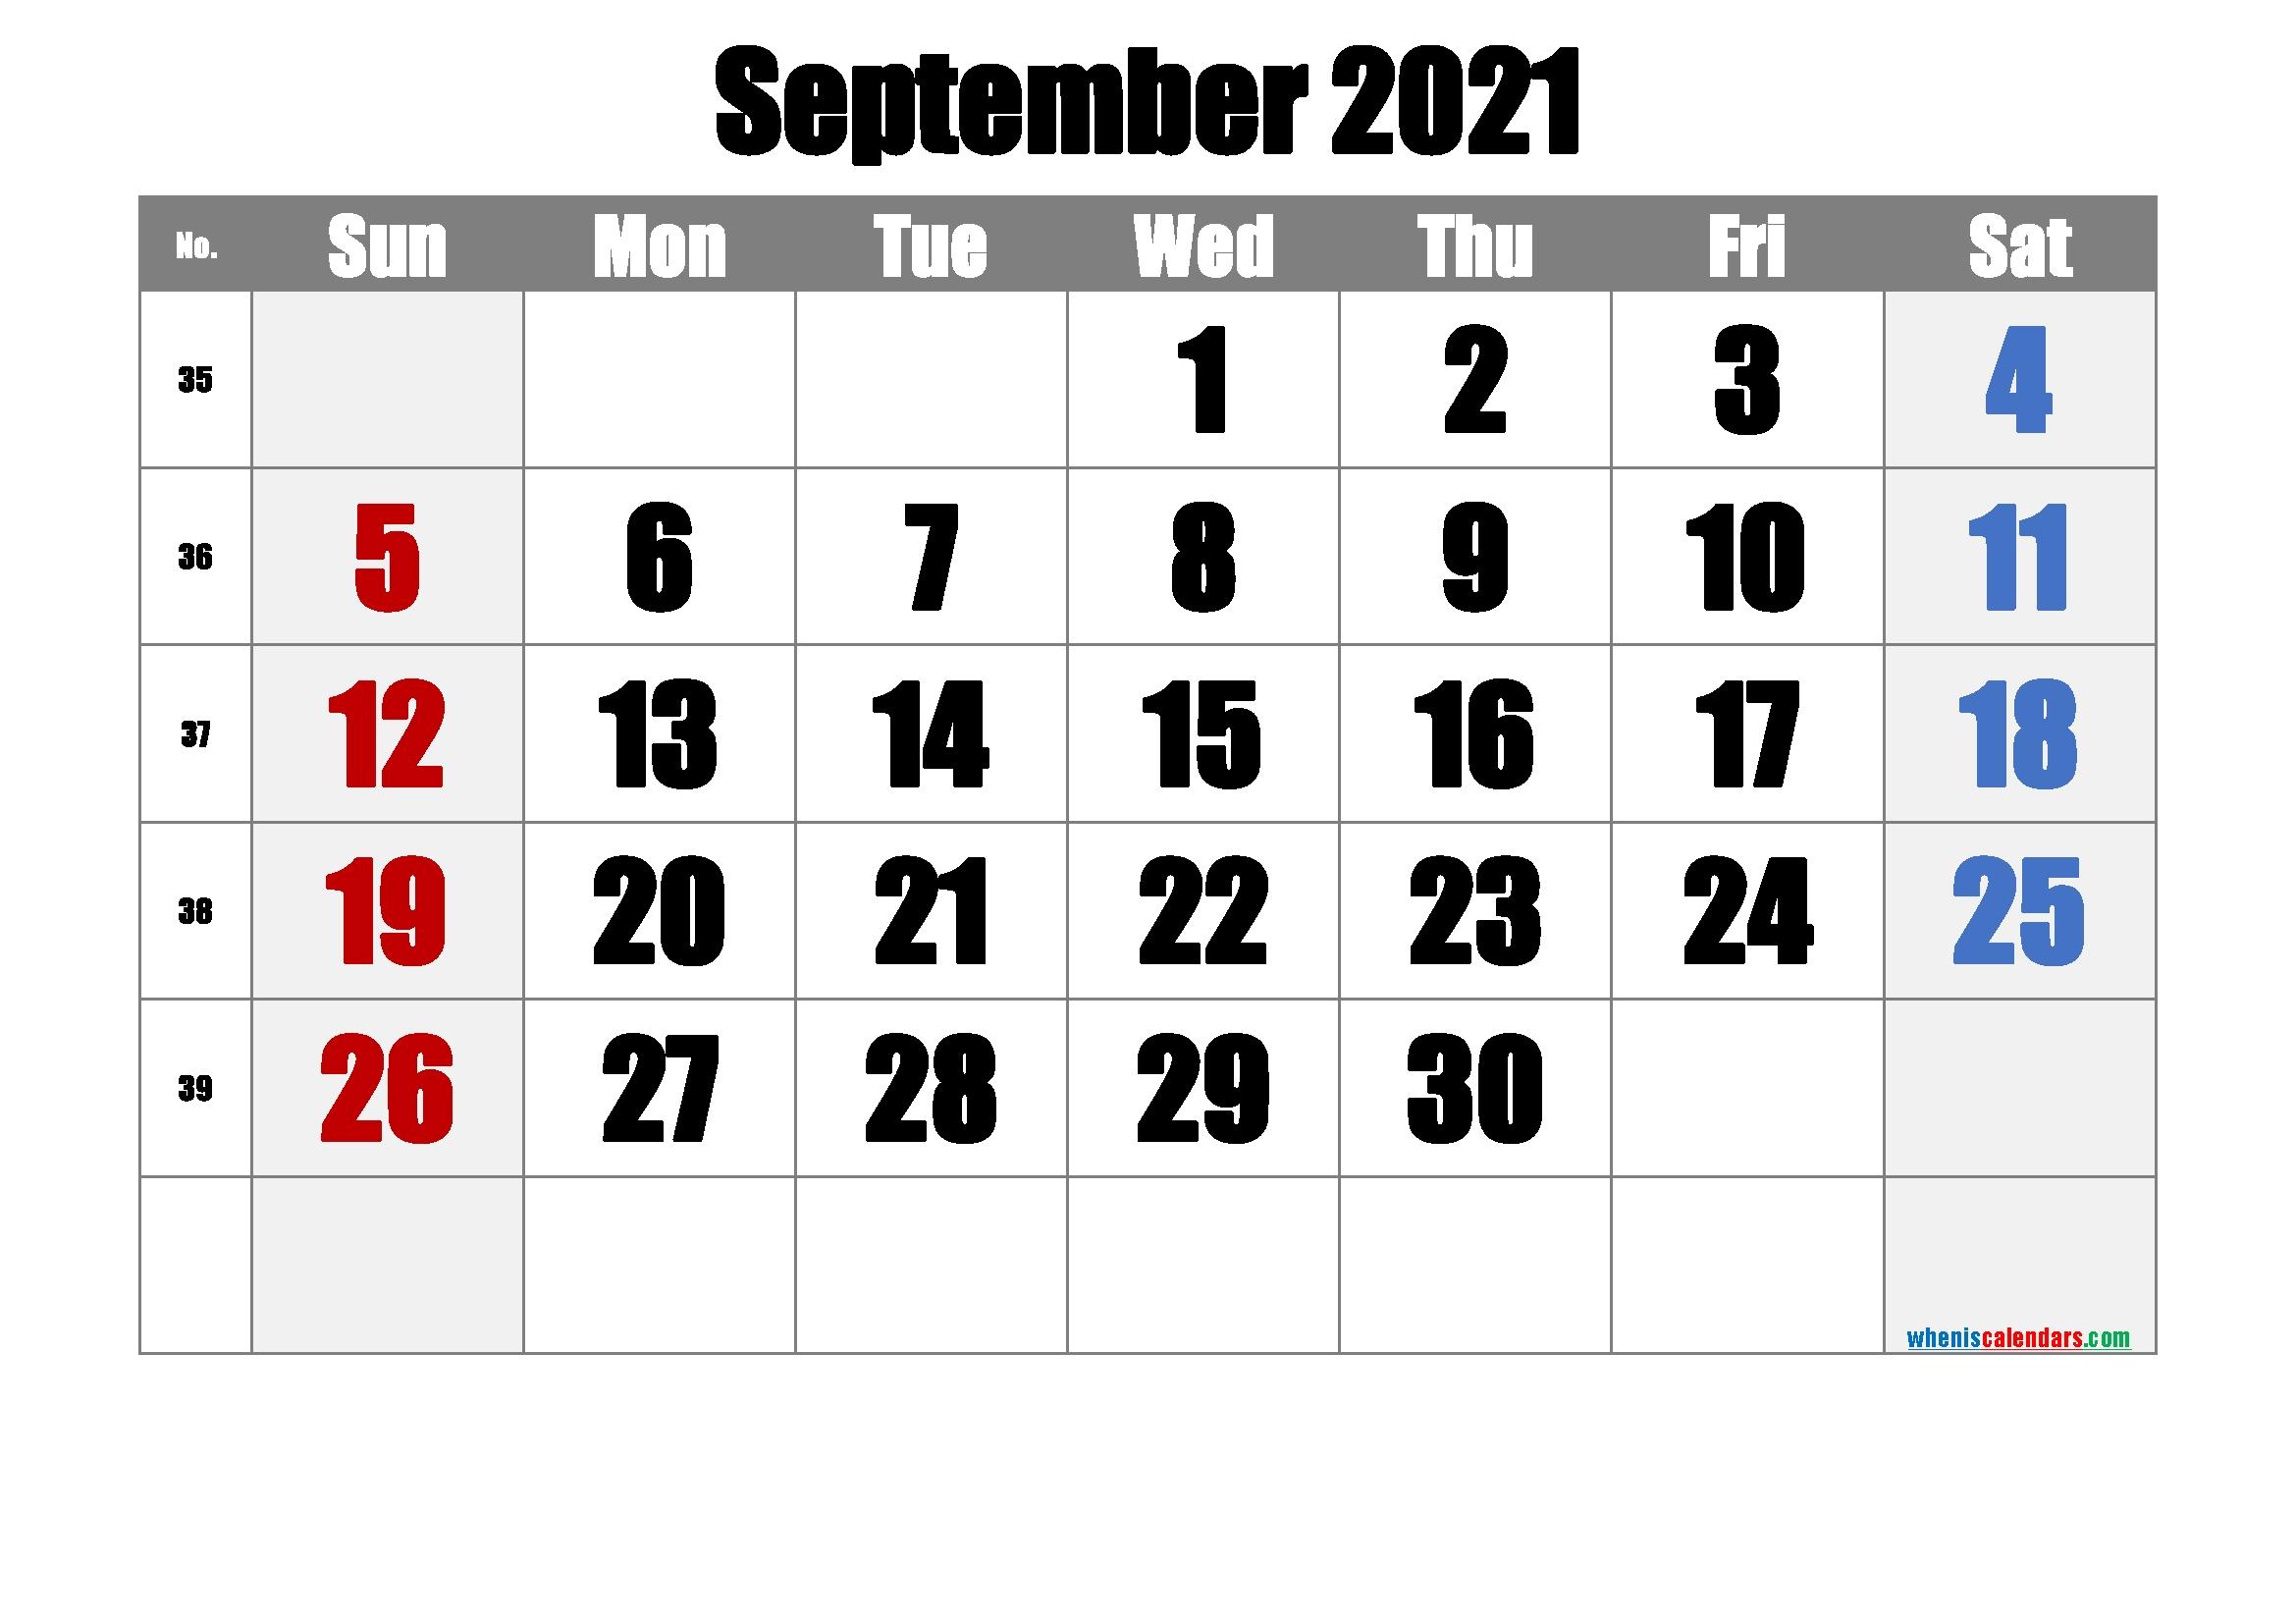 September 2021 Printable Calendar - 6 Templates - Free Printable 2020 Monthly Calendar With Holidays September October November 2021 Calendar